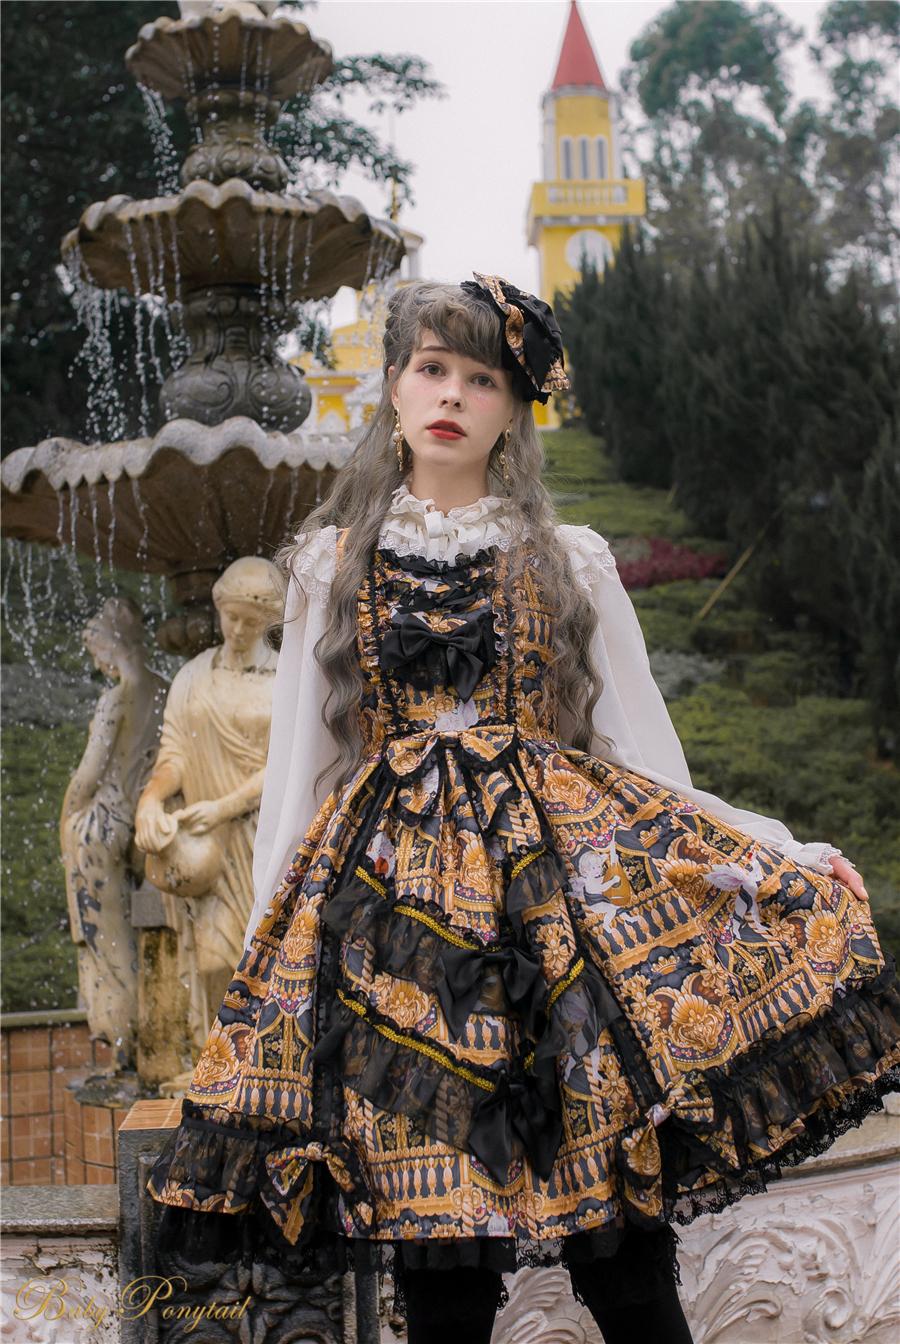 Babyponytail_Model_JSK_Black Present Angel_Claudia_2_8.jpg